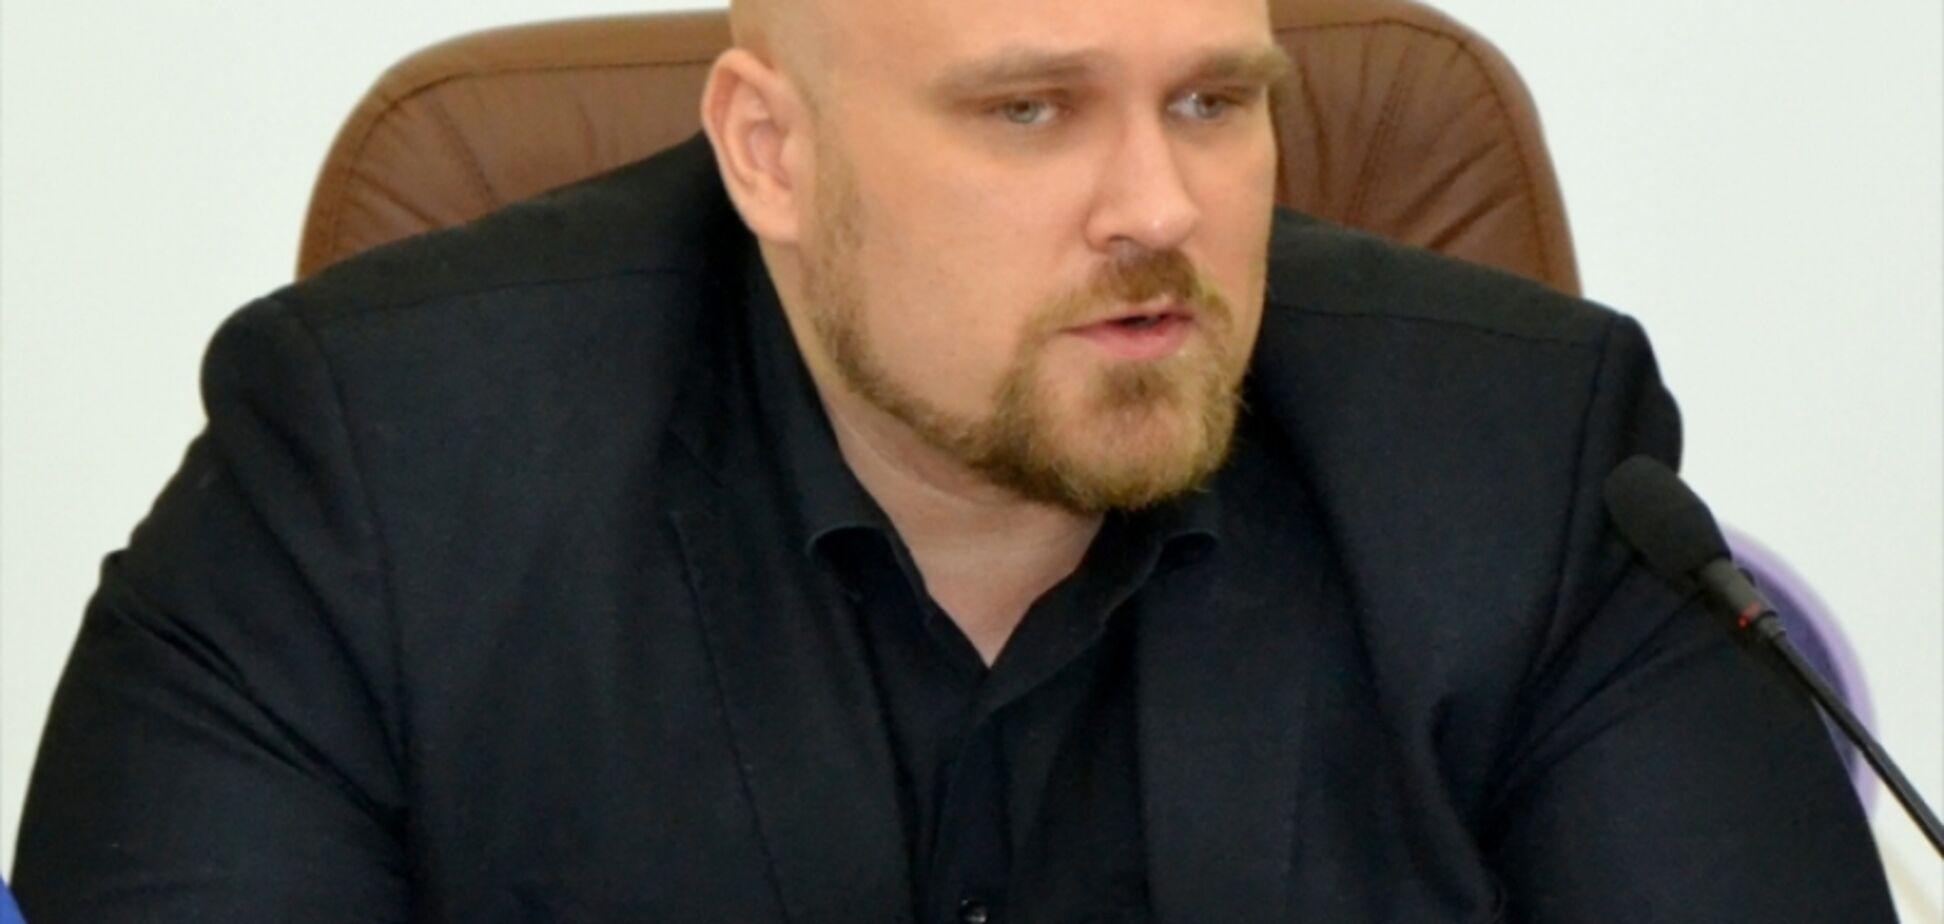 ''Знаю точно'': екс-ватажок ''ДНР'' назвав організатора вбивства Захарченка